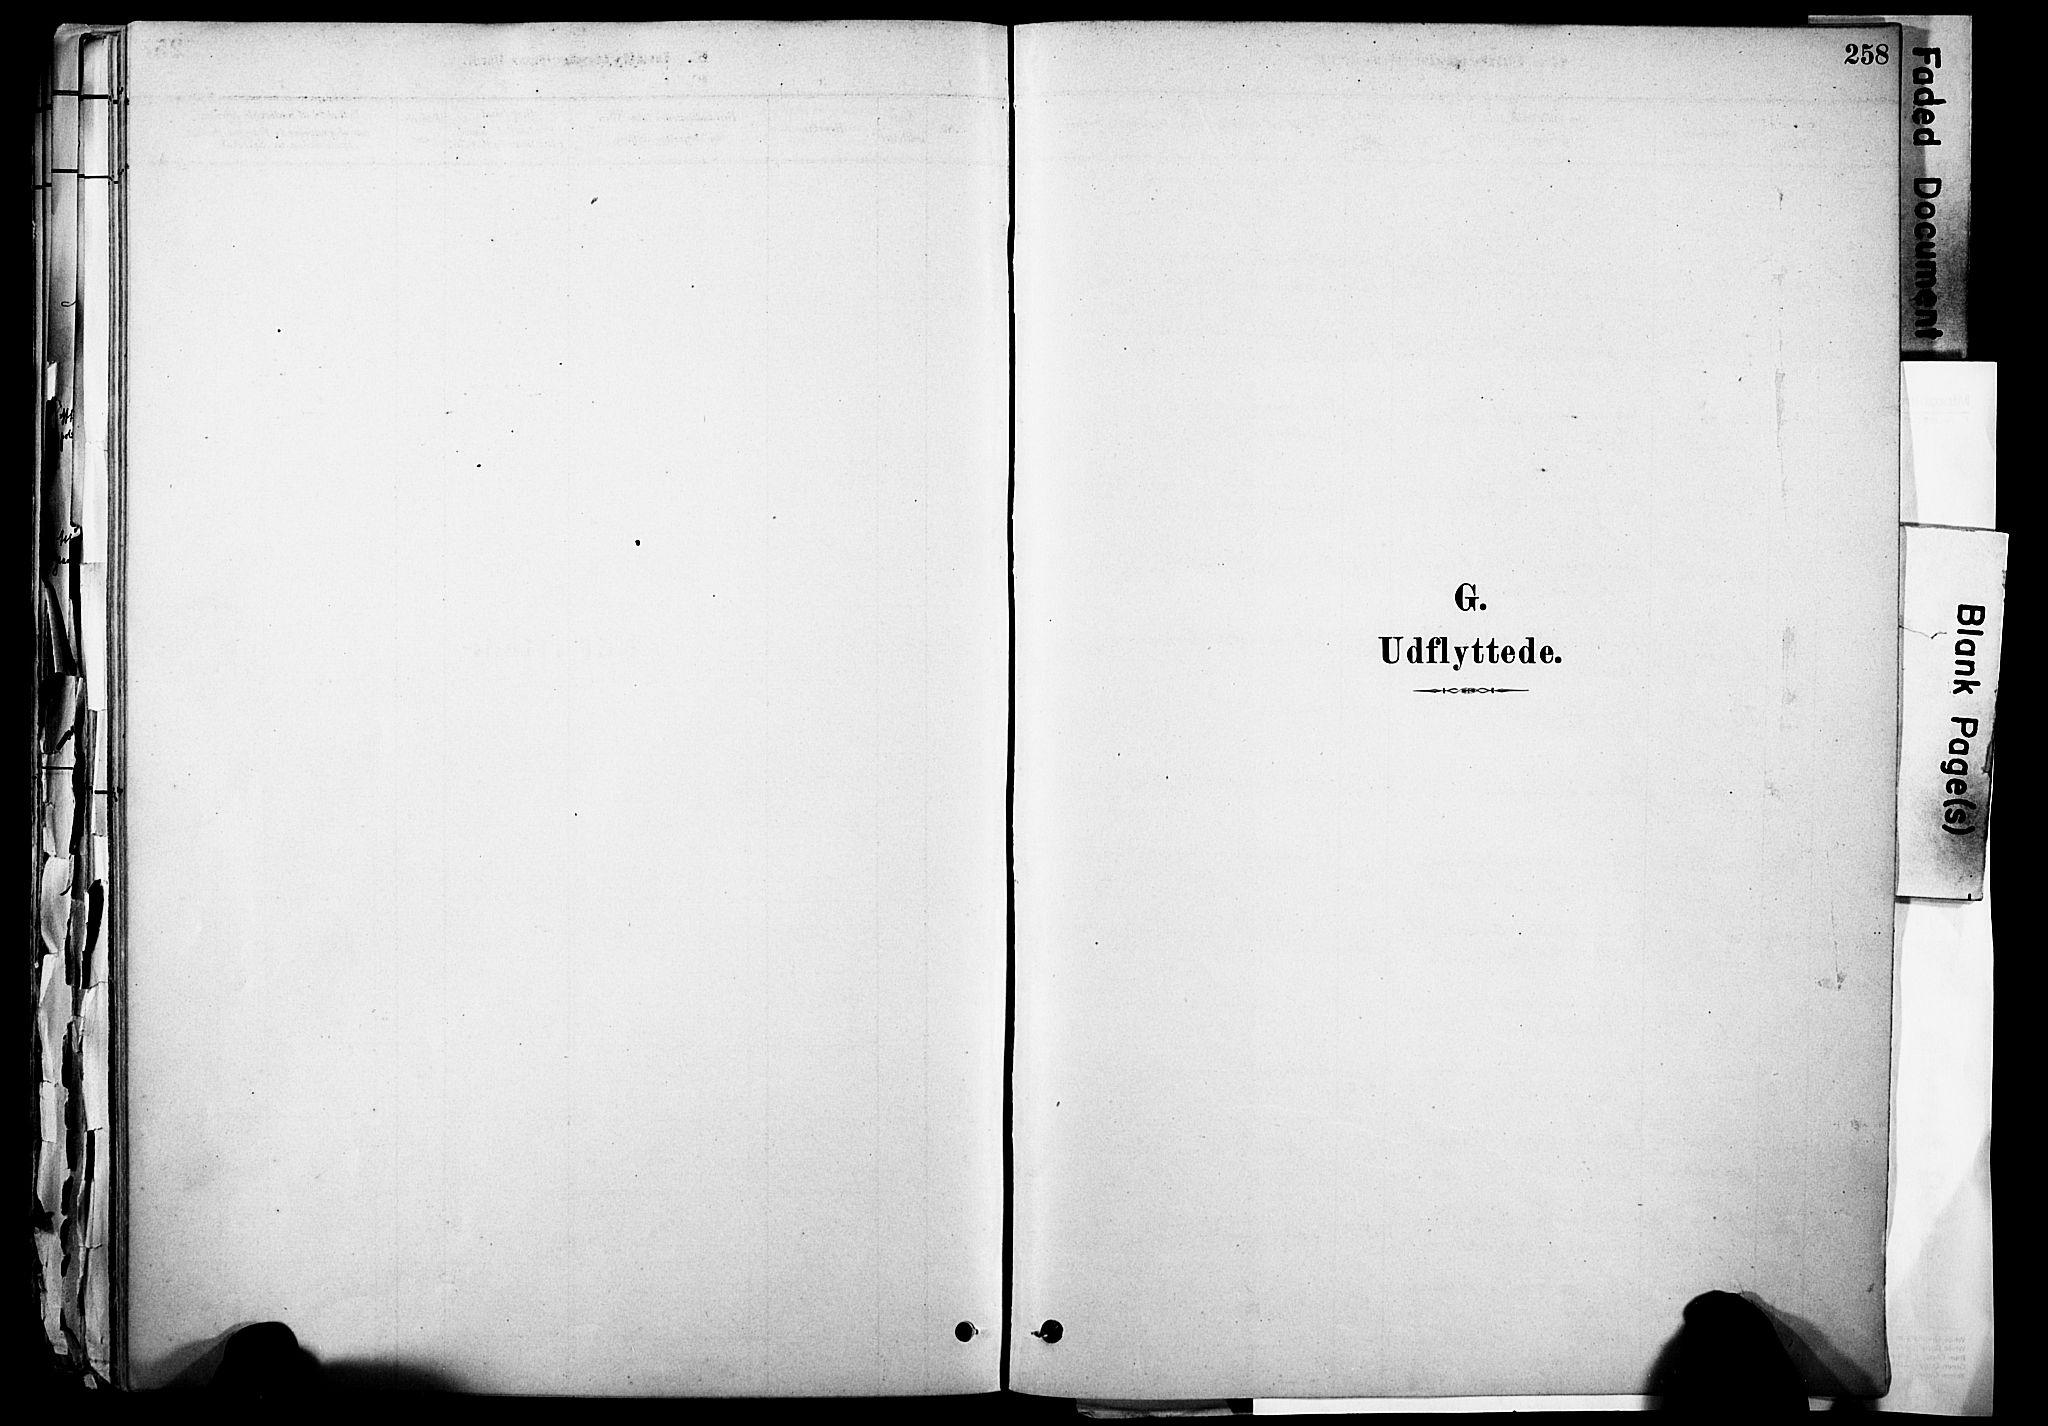 SAH, Skjåk prestekontor, Ministerialbok nr. 3, 1880-1907, s. 258